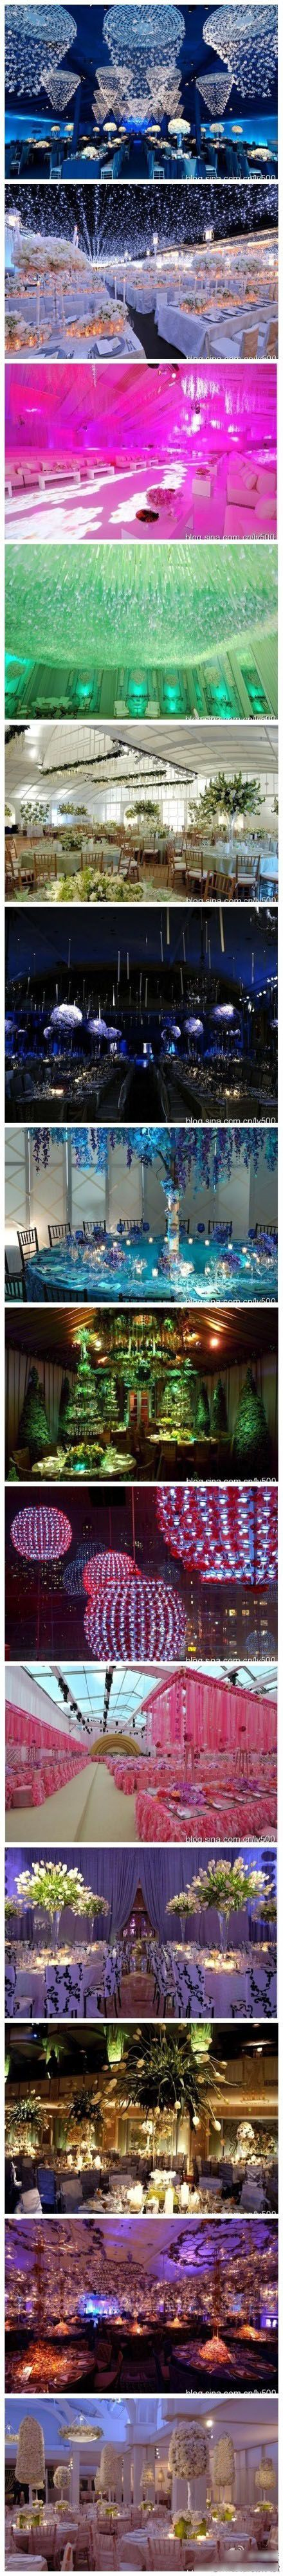 wedding hall decor, gorgeous!